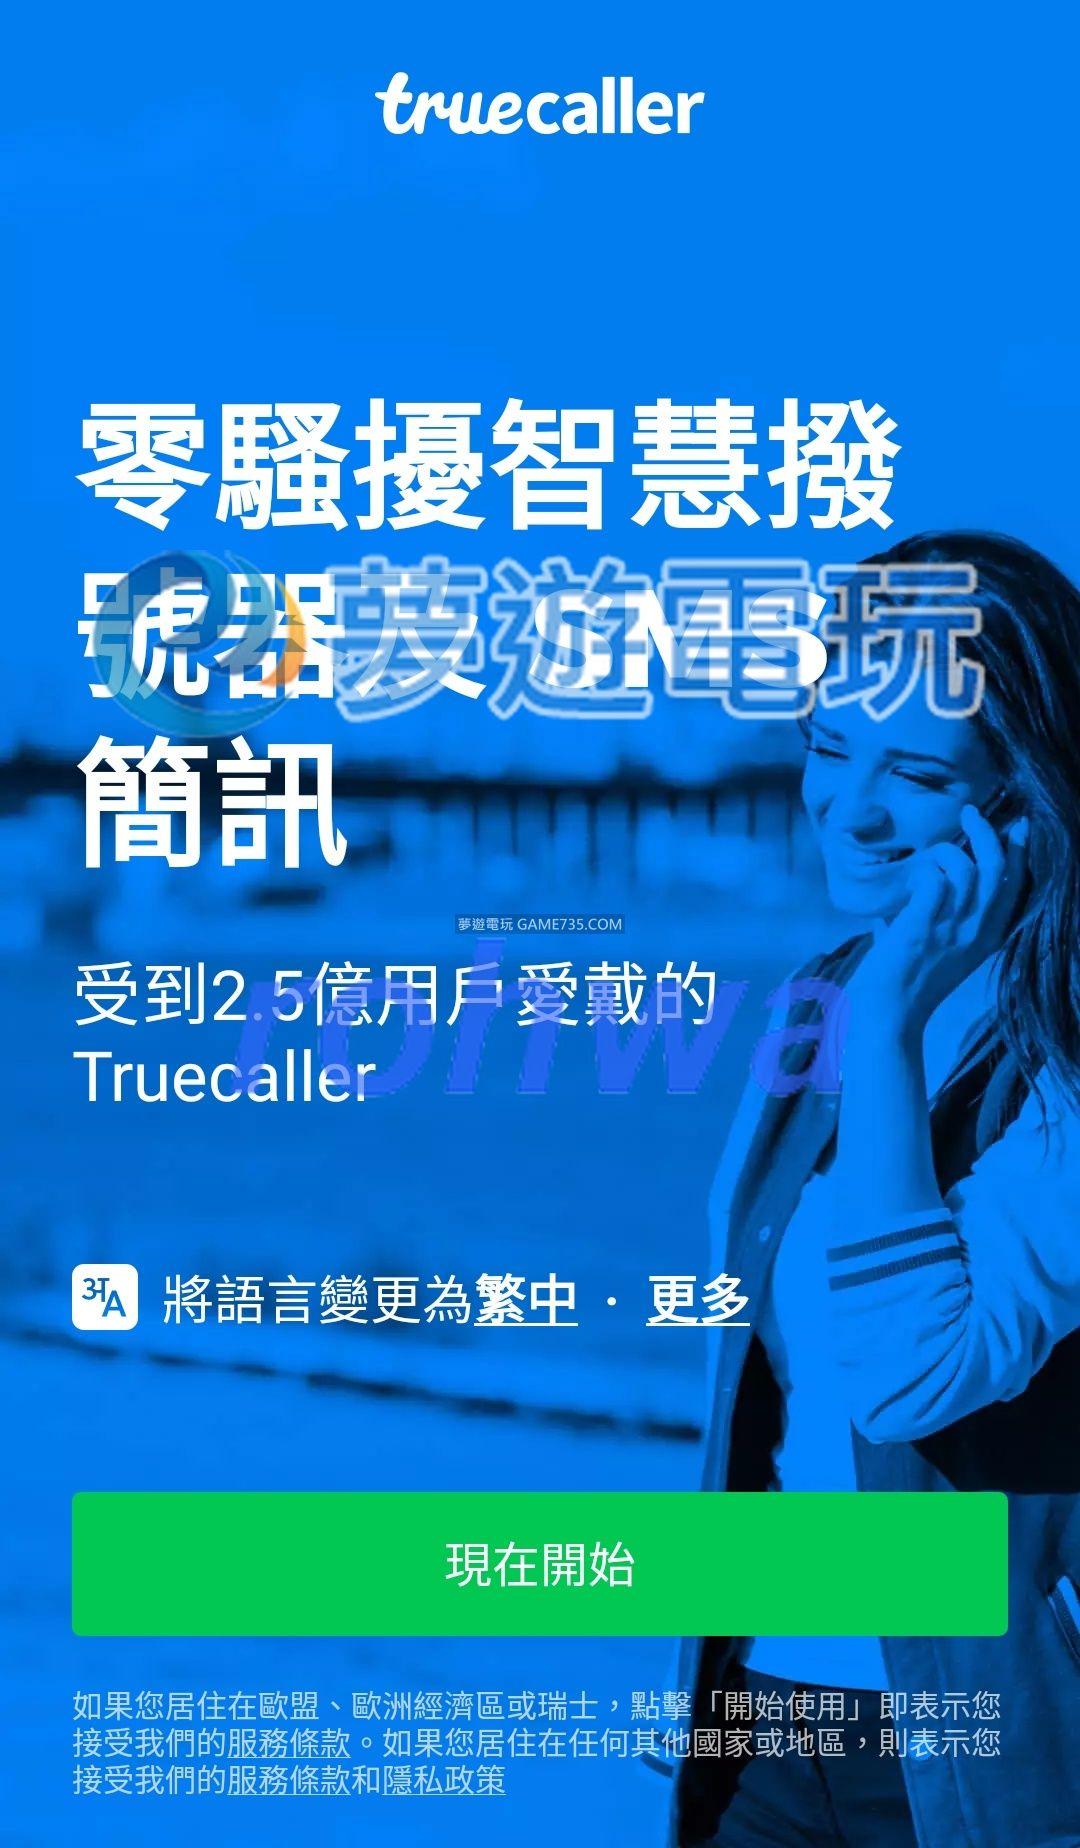 Truecaller__1_.jpg